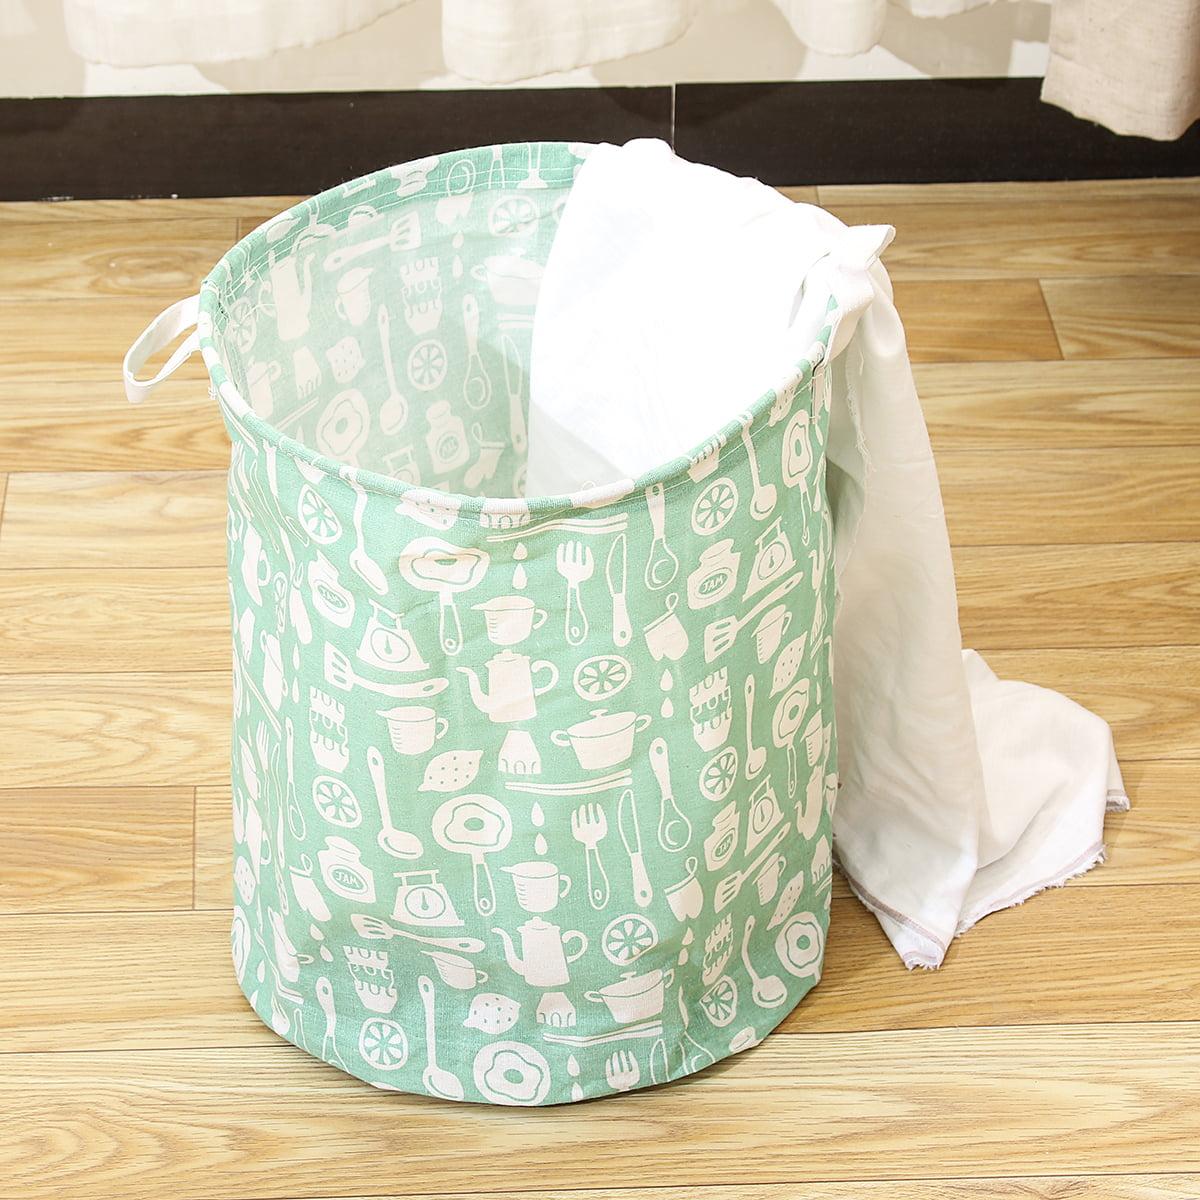 Dirty Clothes Storage Bag Basket Laundry Diamante Washing Bin Foldable Hamper